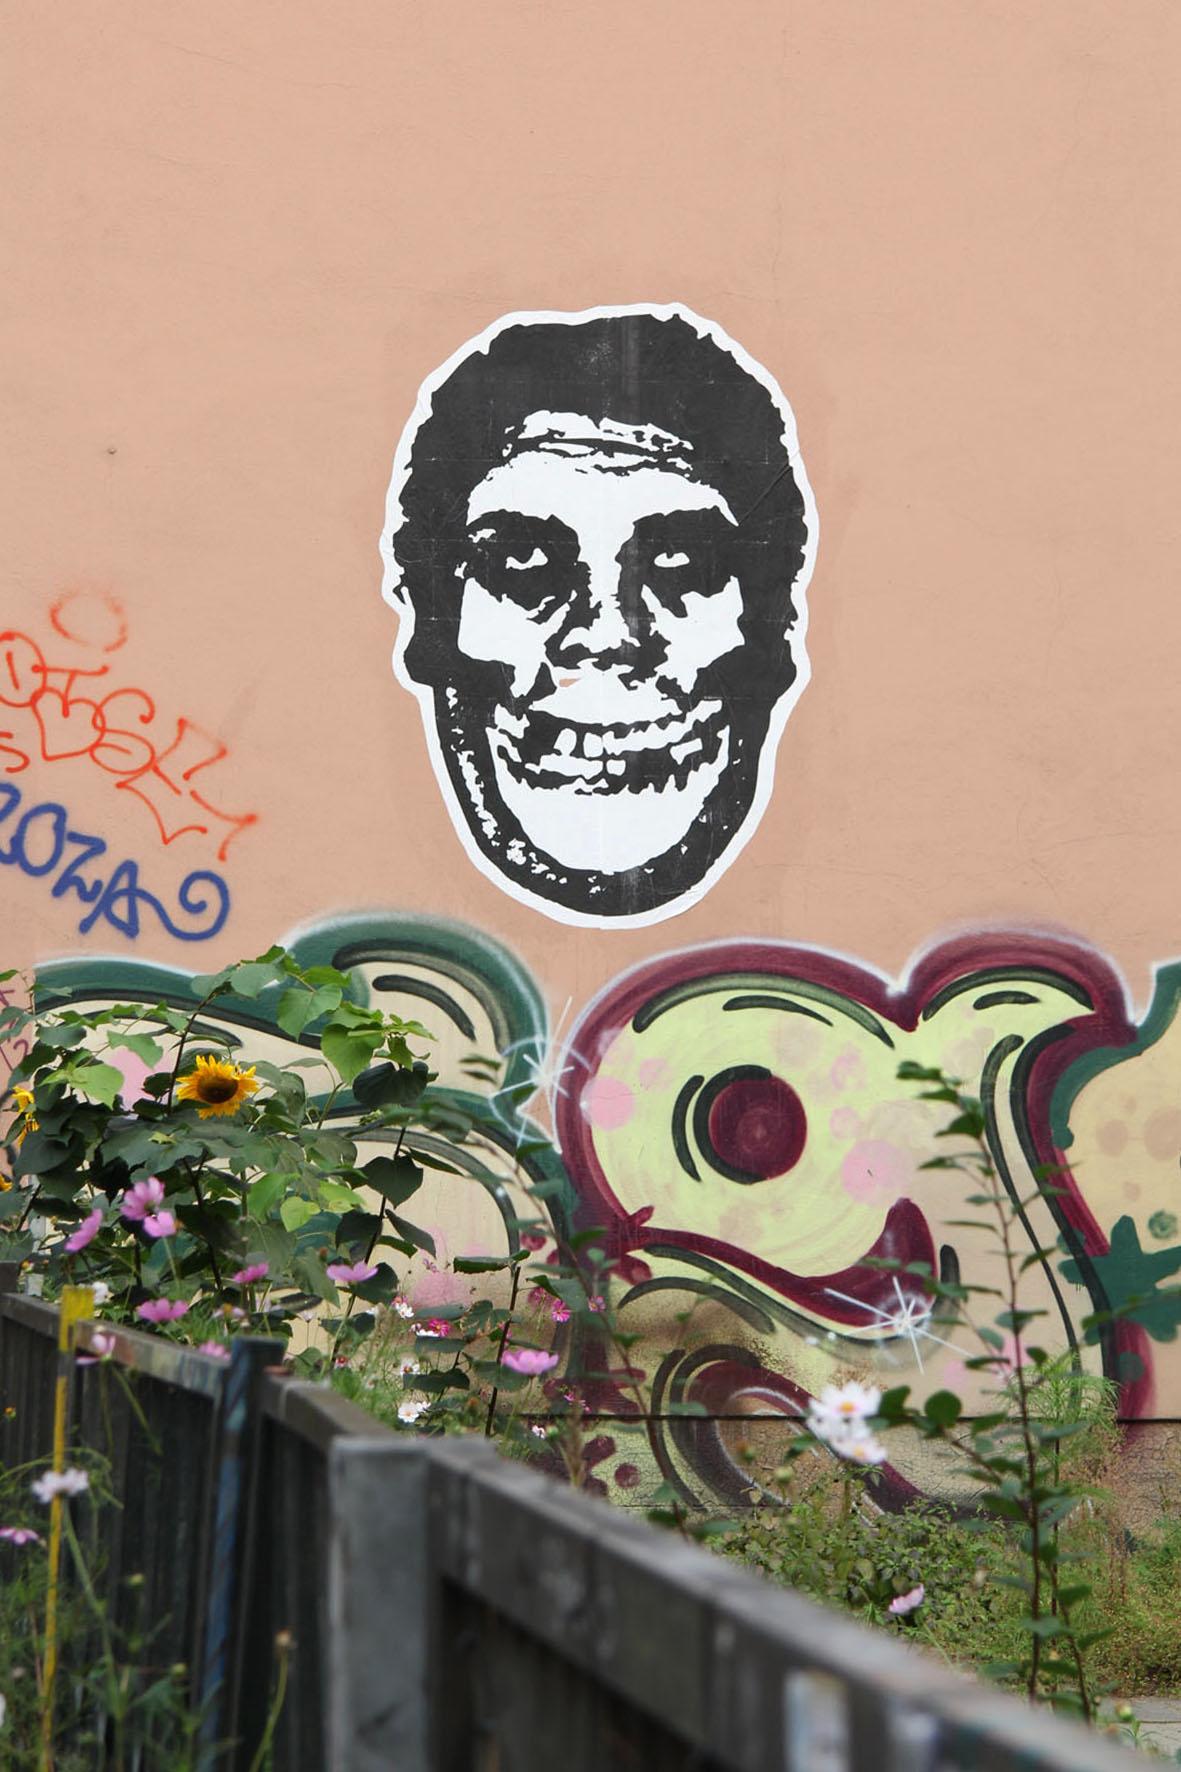 shepard fairey � obey the giant in berlin andberlin